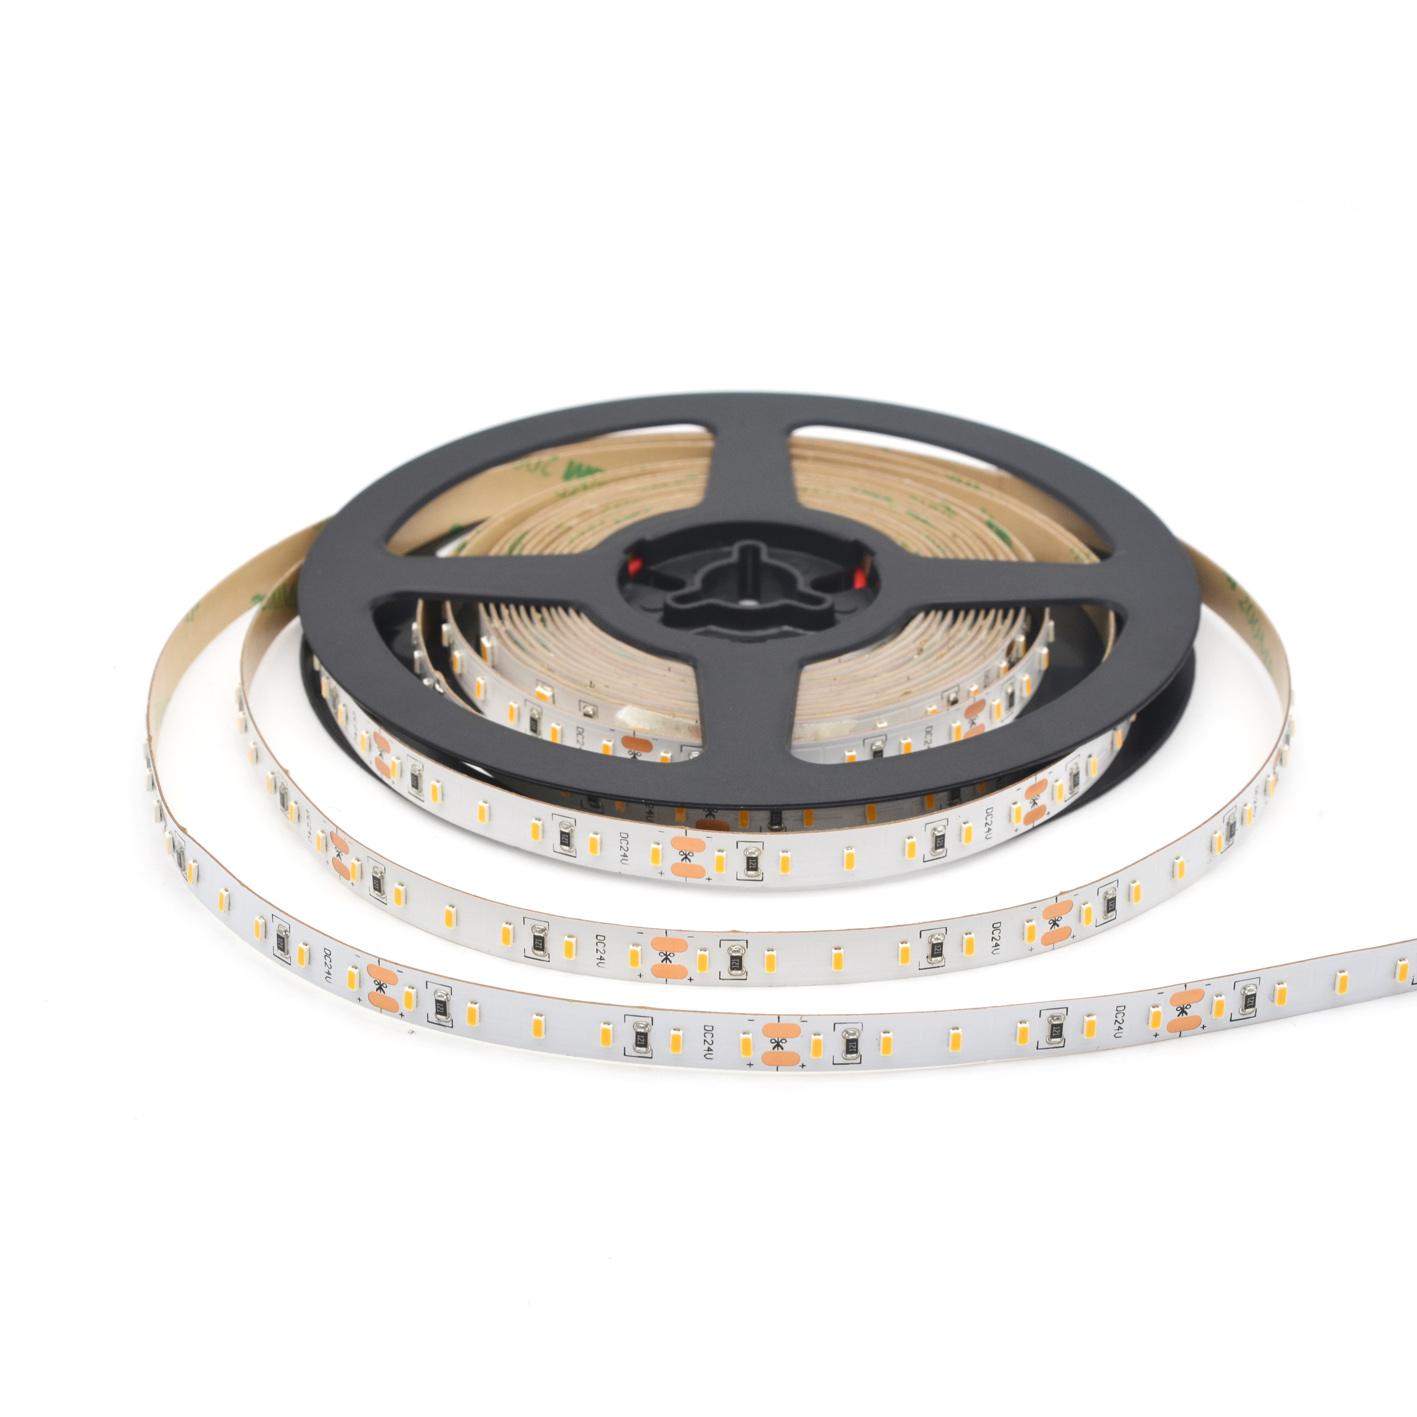 SMD3014 LED Flexible Strip 140LEDs